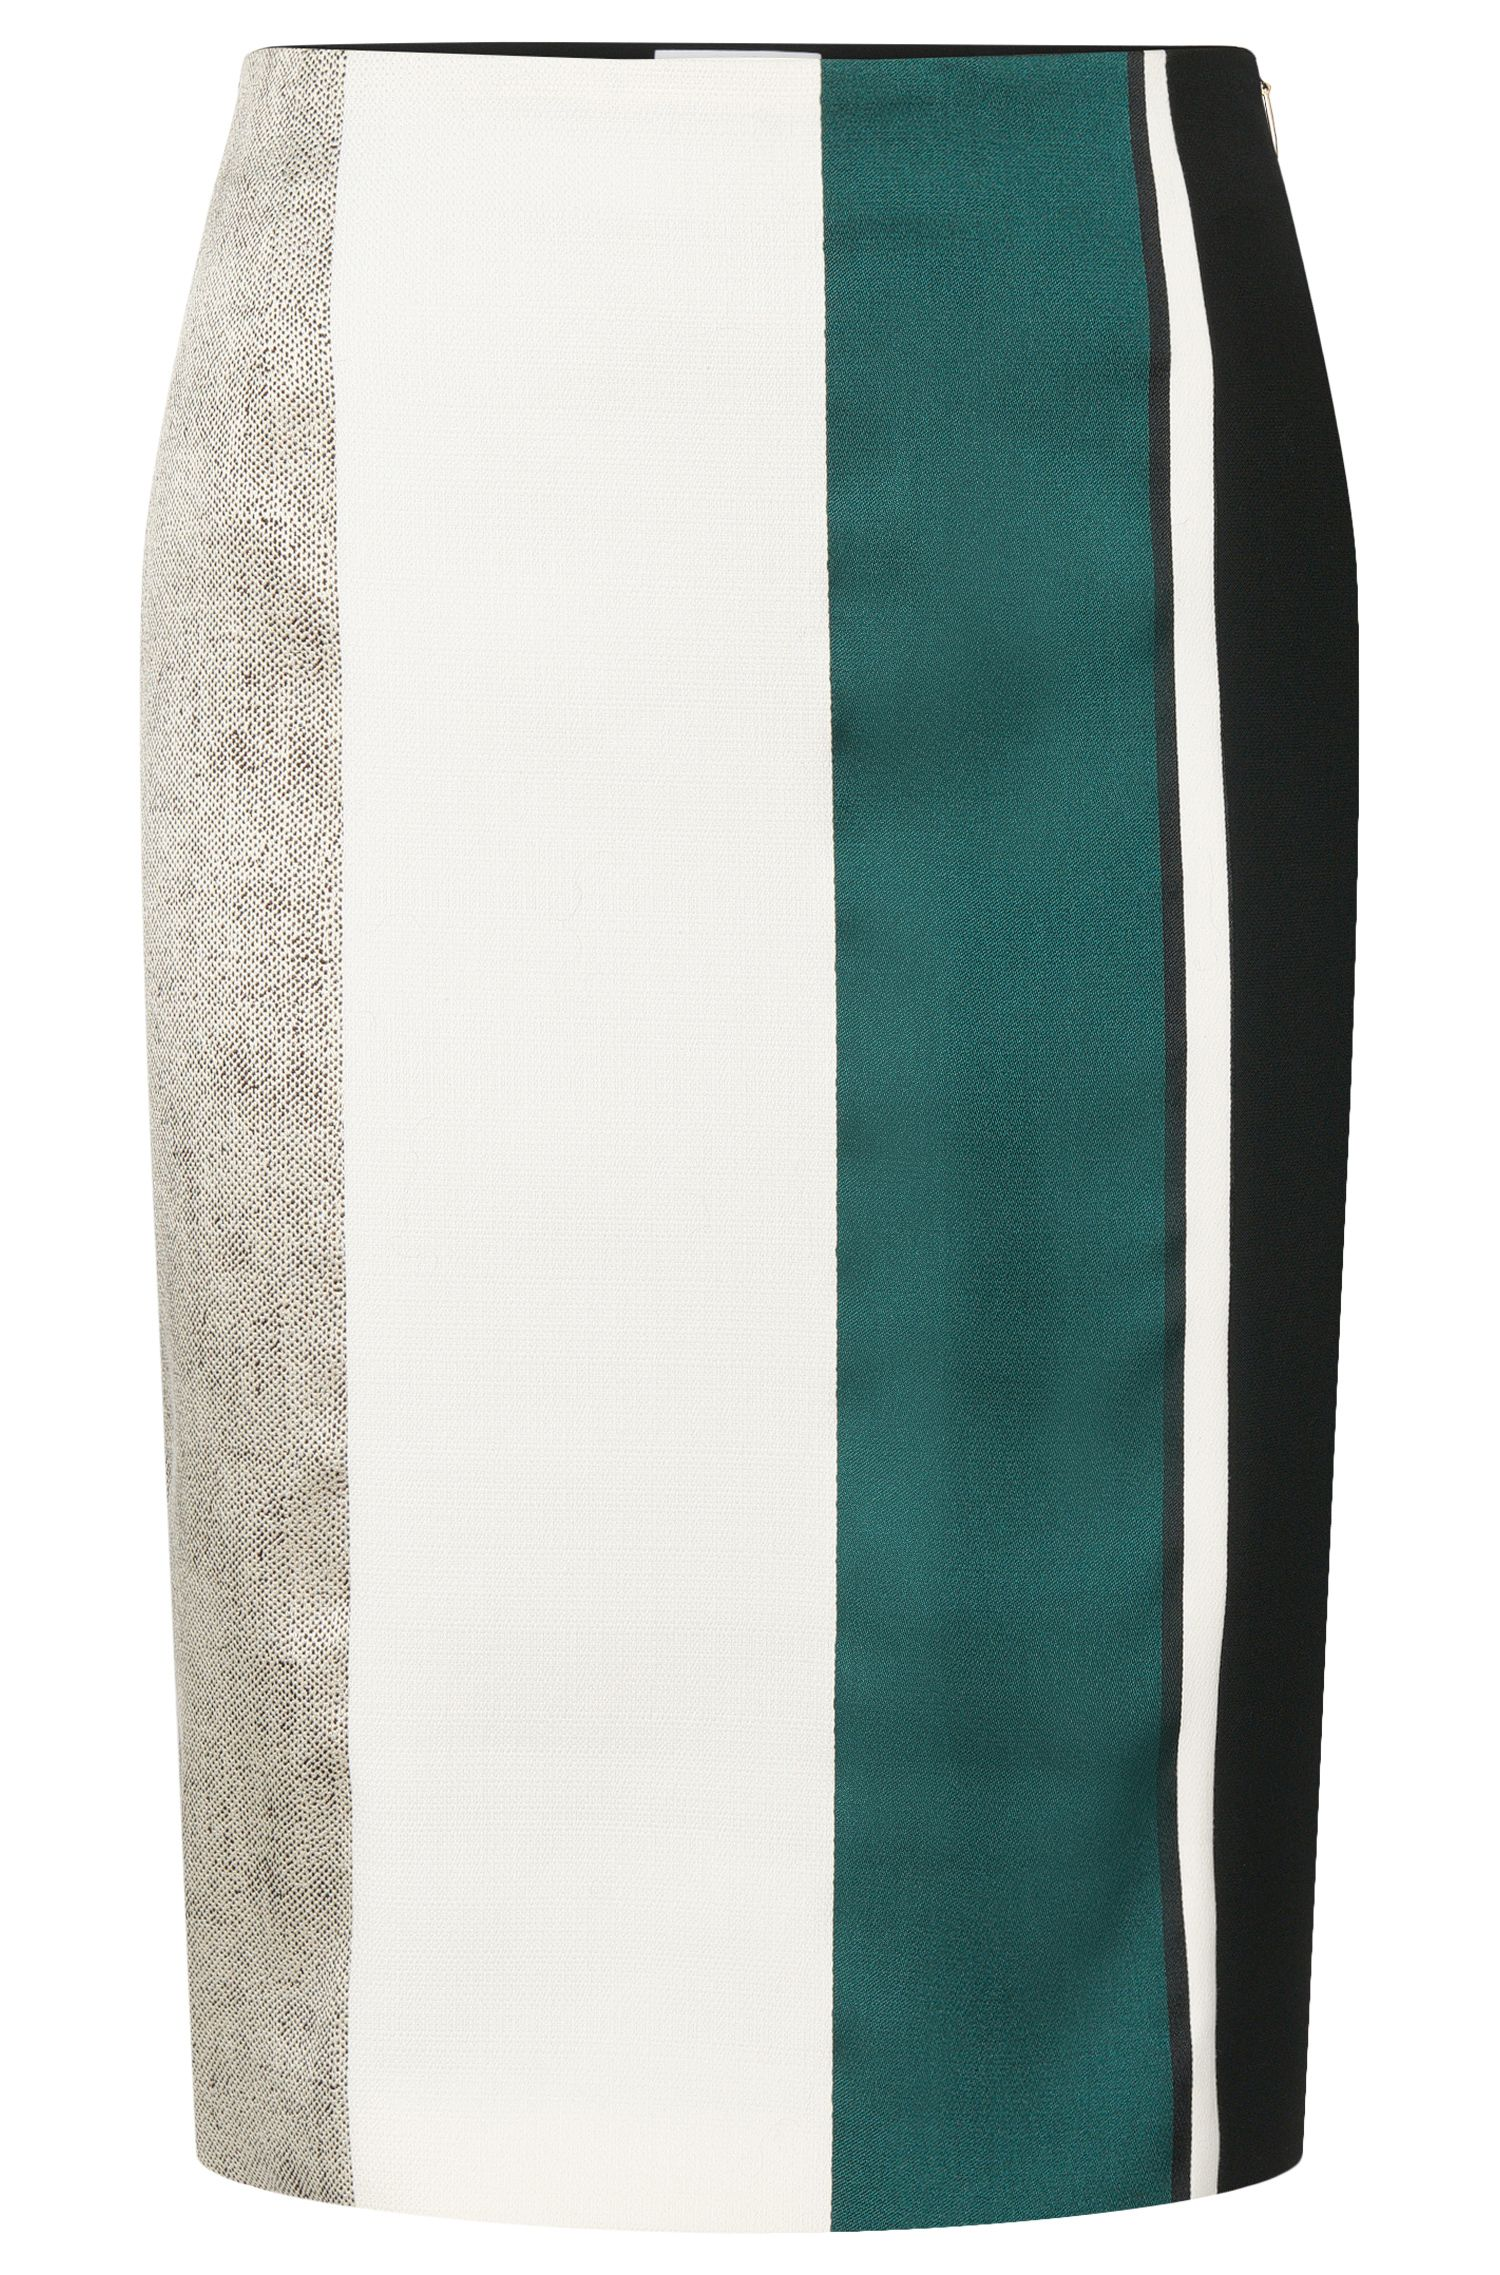 'Vastrina' | Cotton Blend Striped Straight Skirt